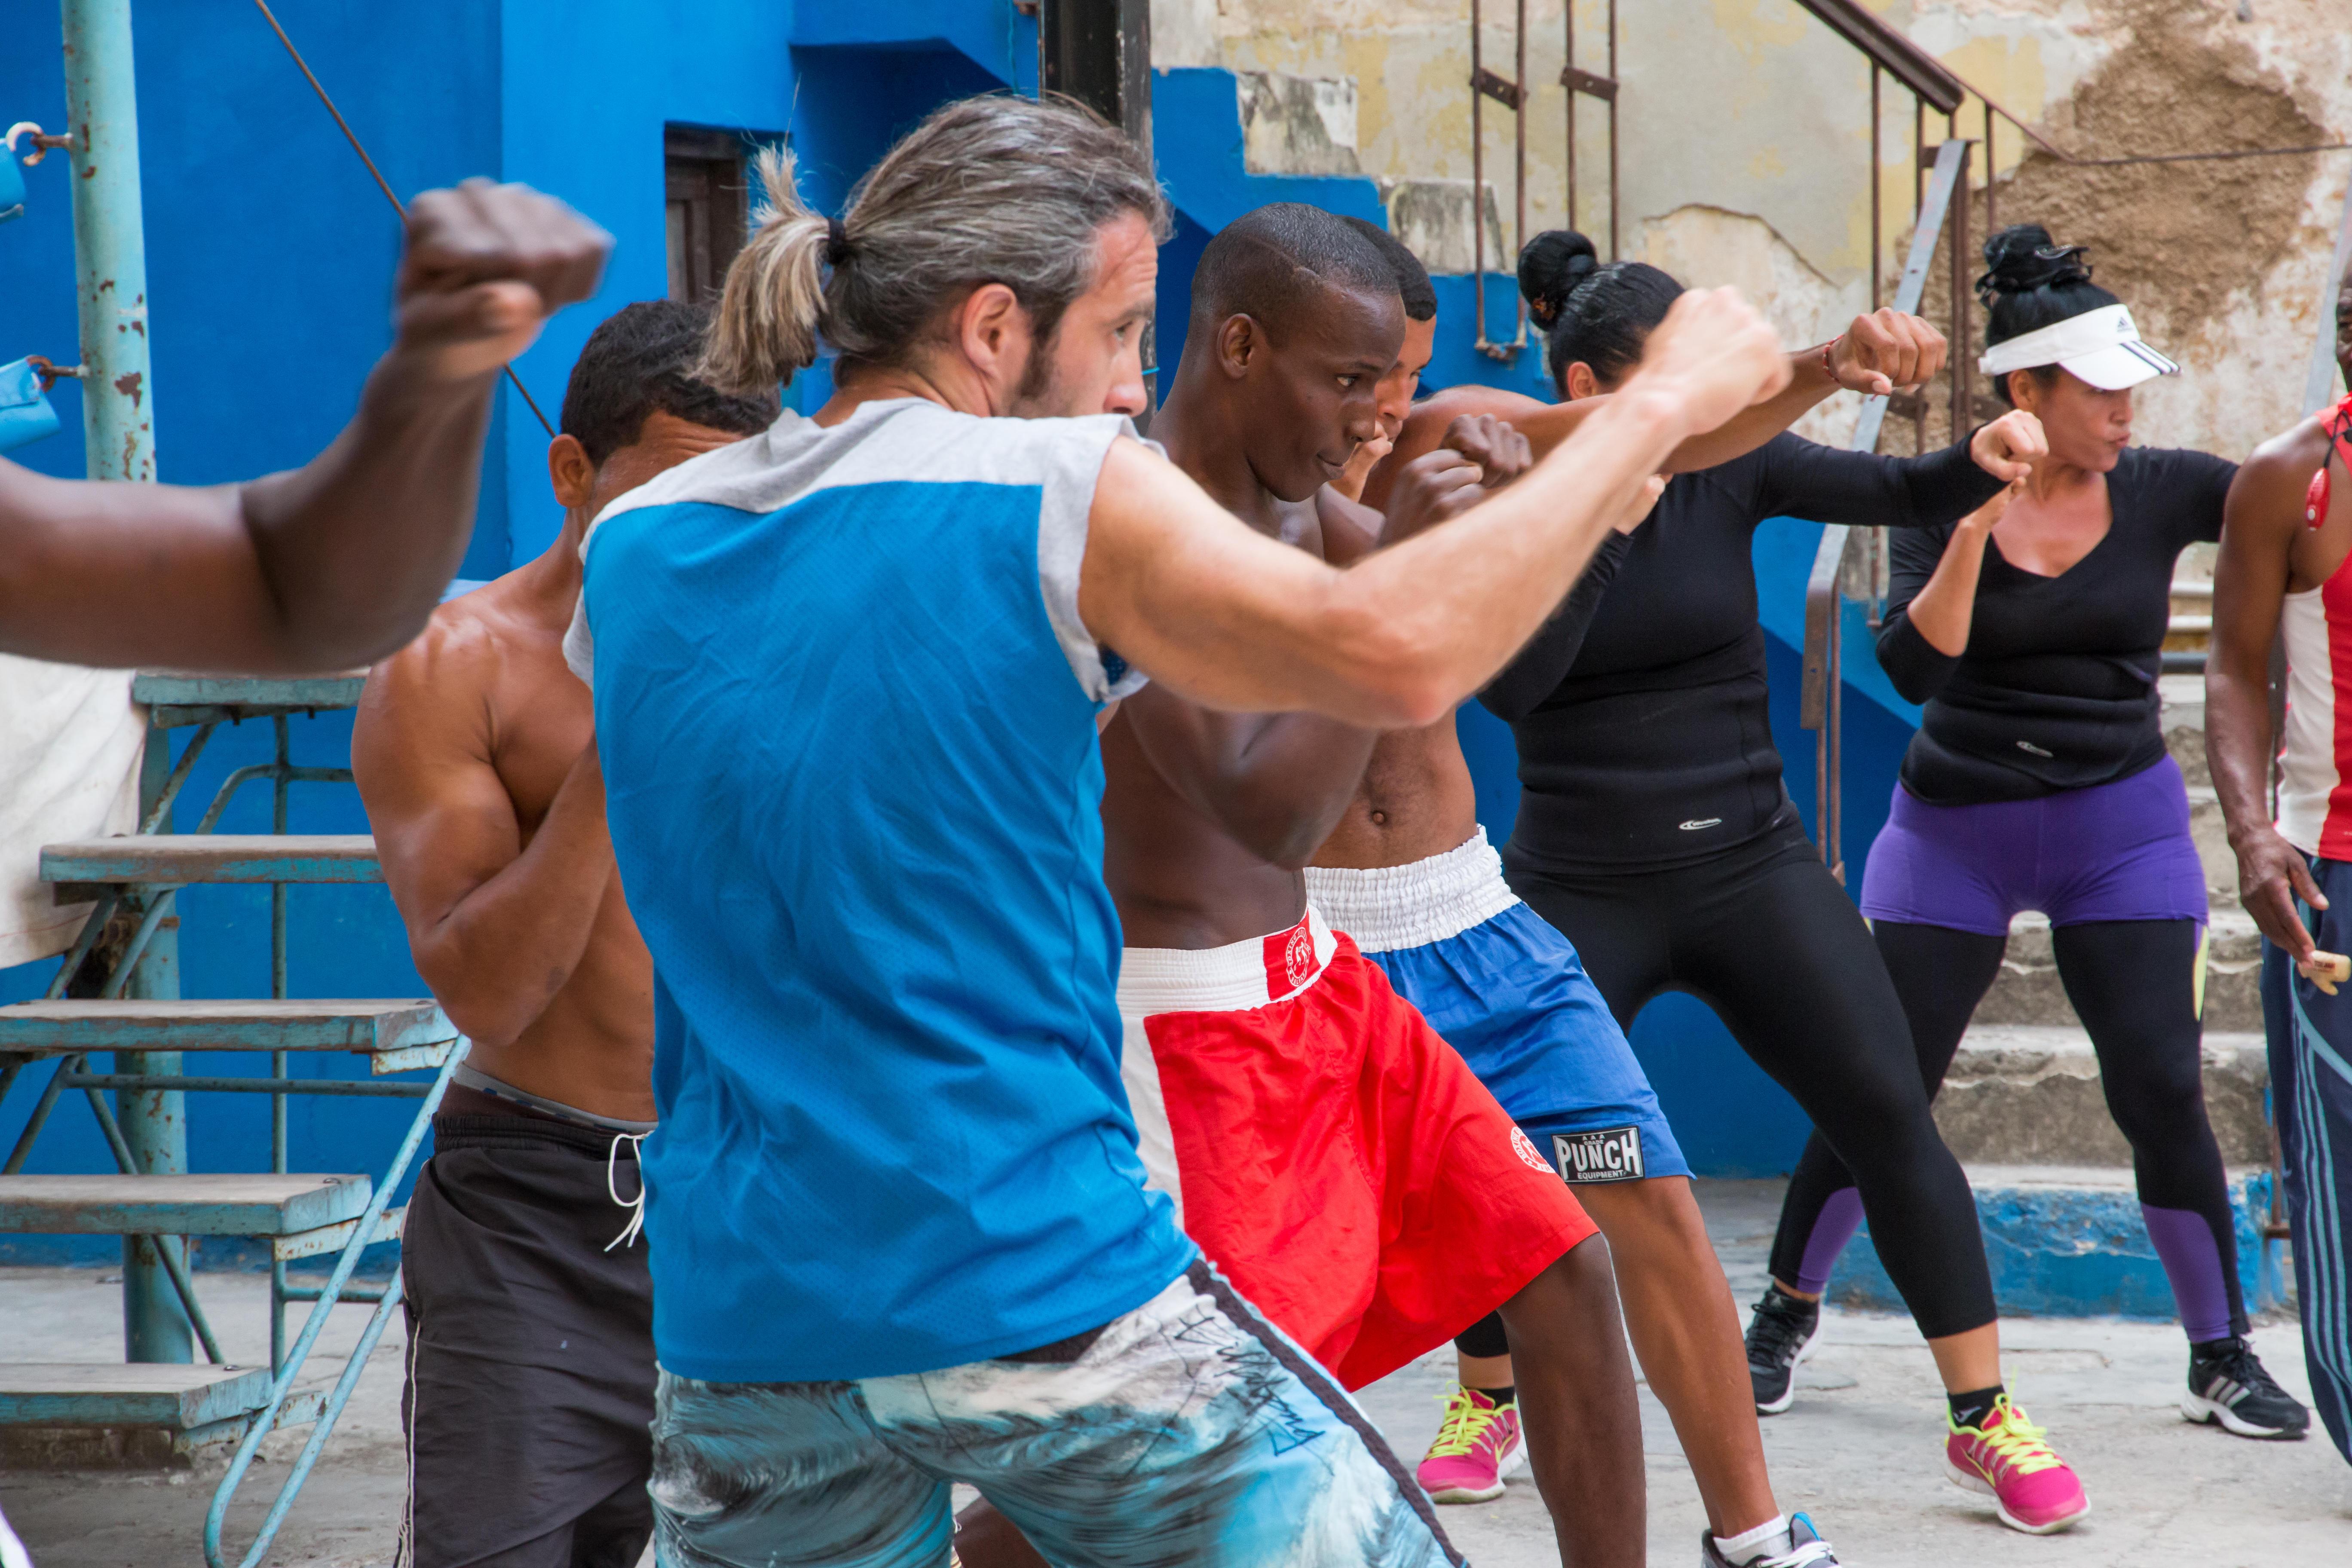 boxing workout class